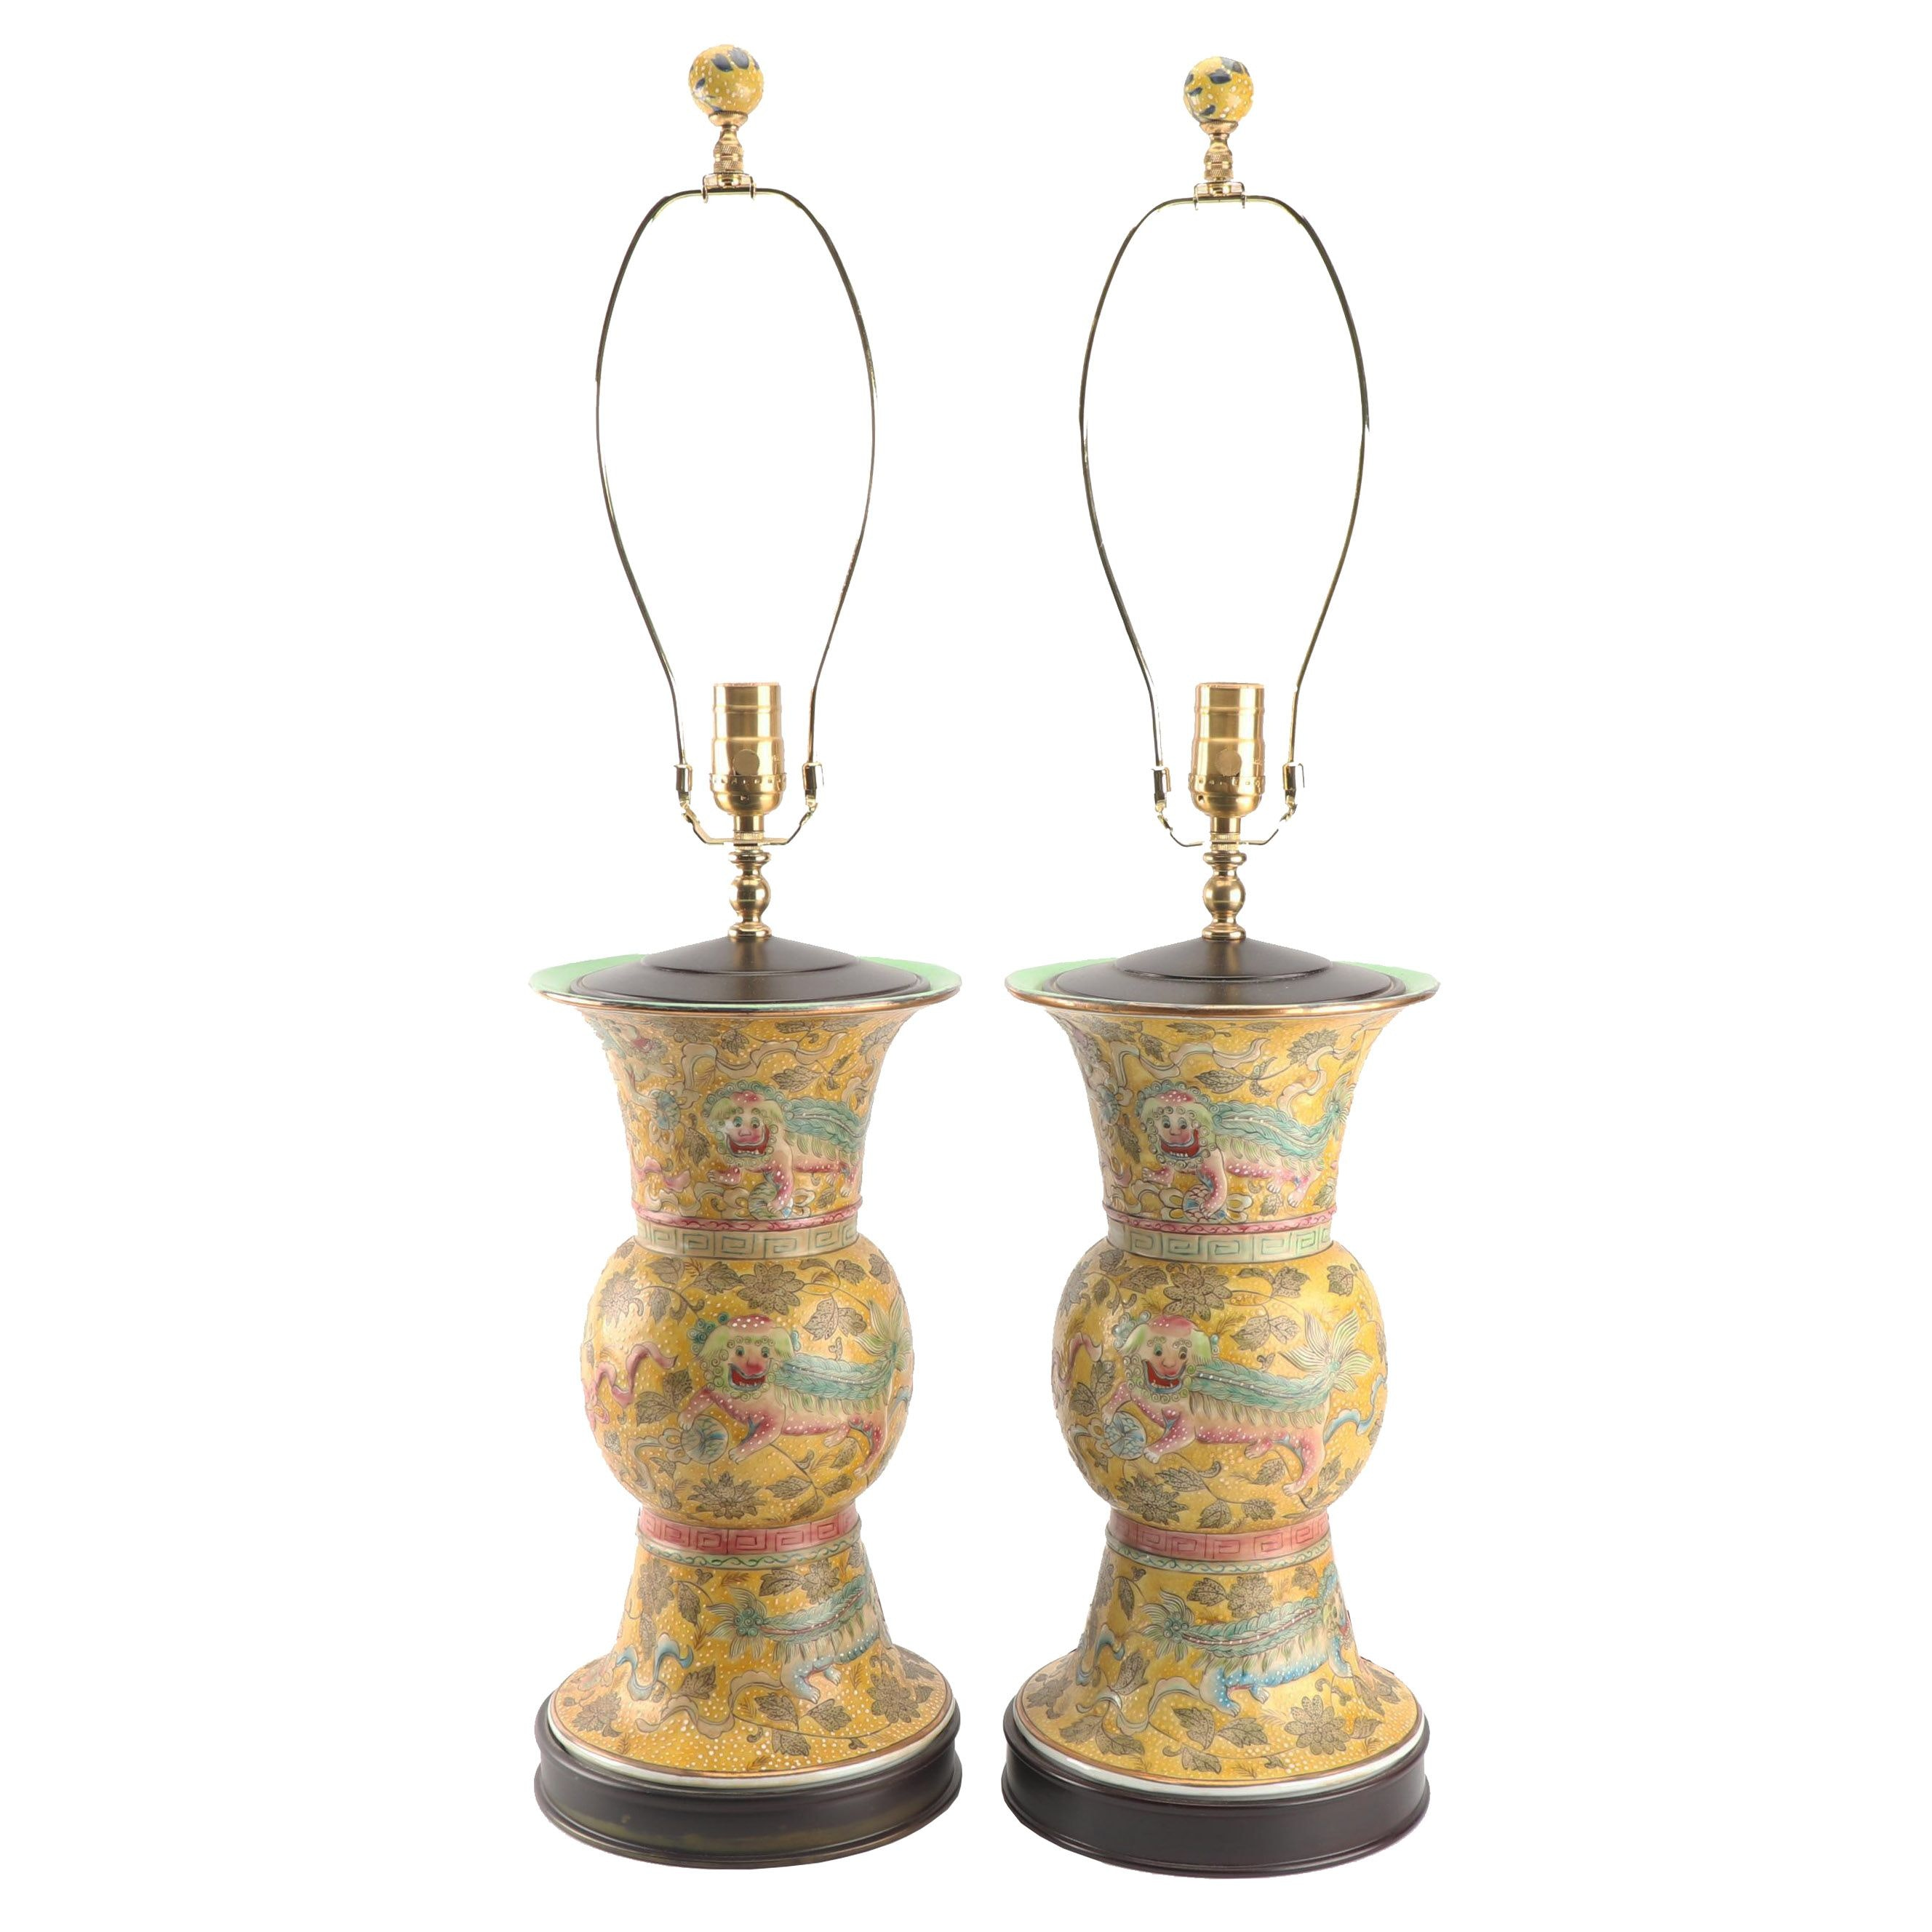 Chinese Famille Jaune Ceramic Gu Vase Table Lamps